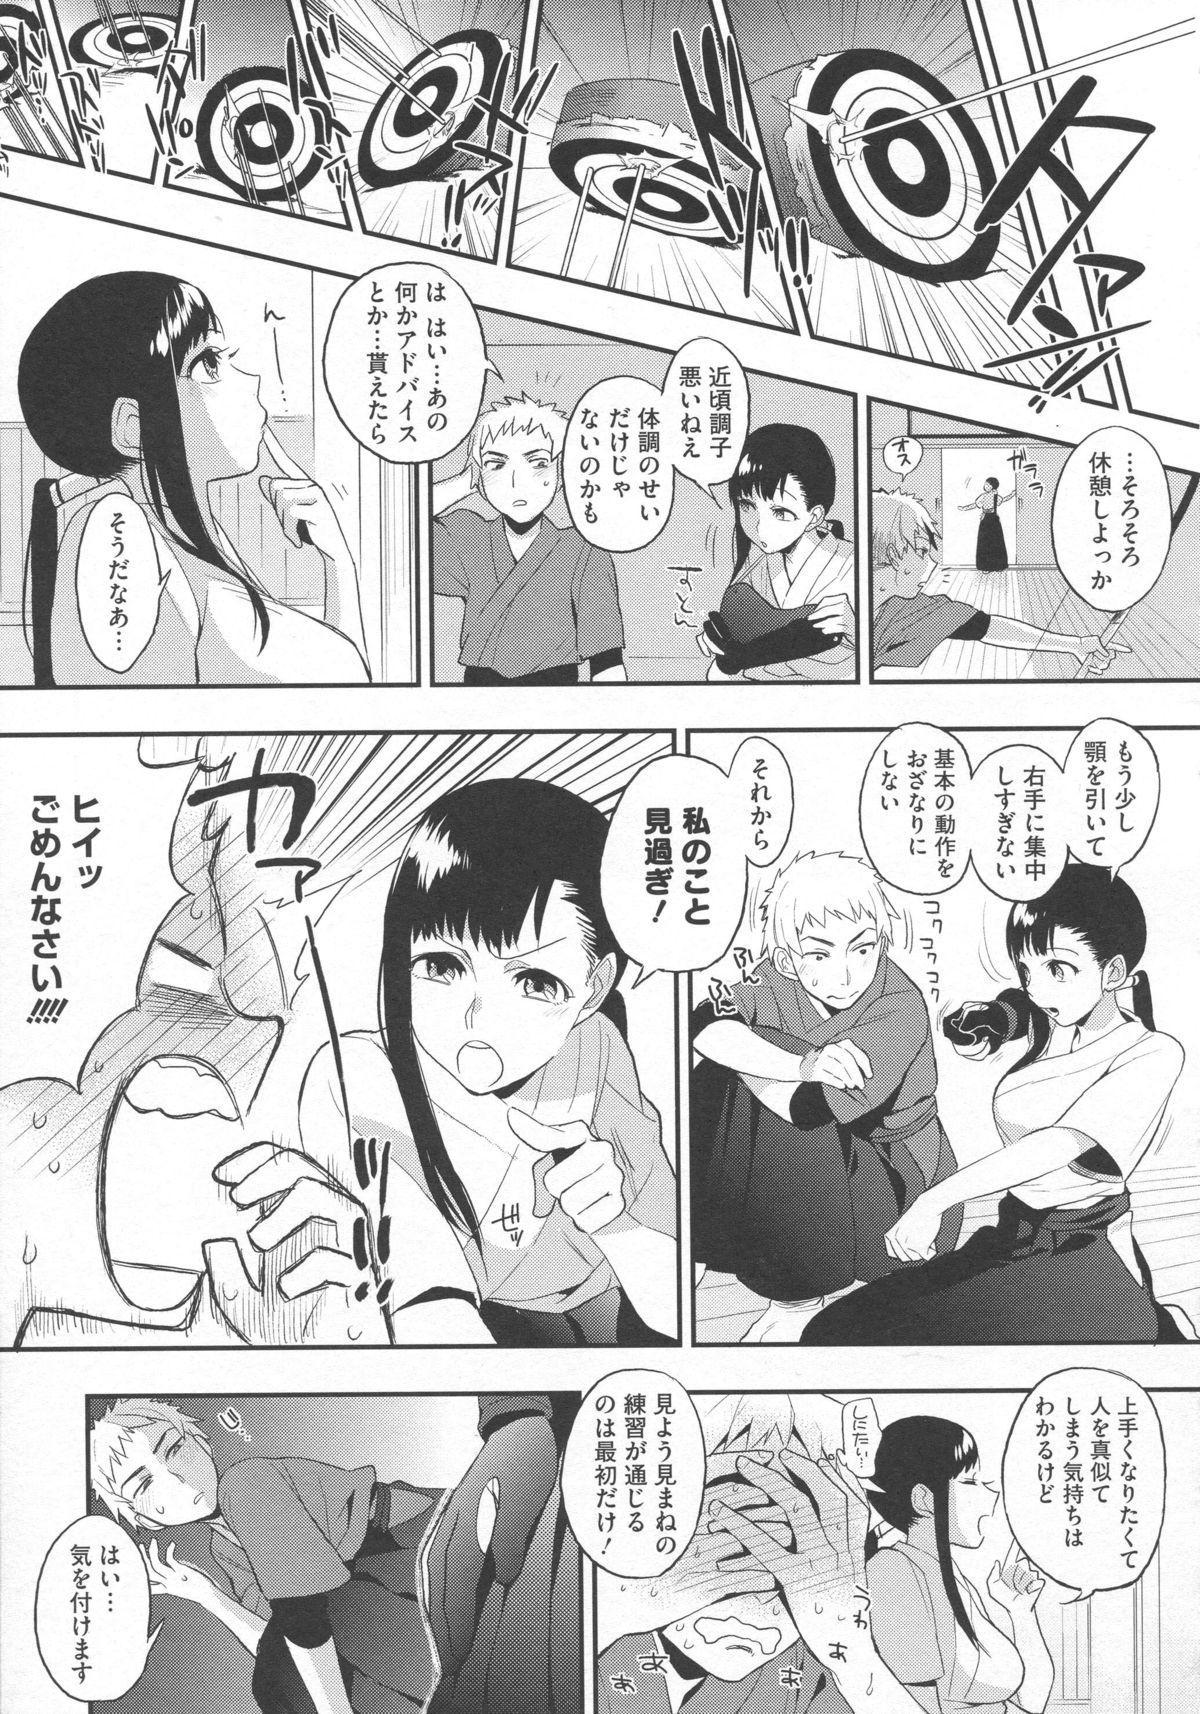 Boku Dake no Yuuyami - Only My Twilight 161